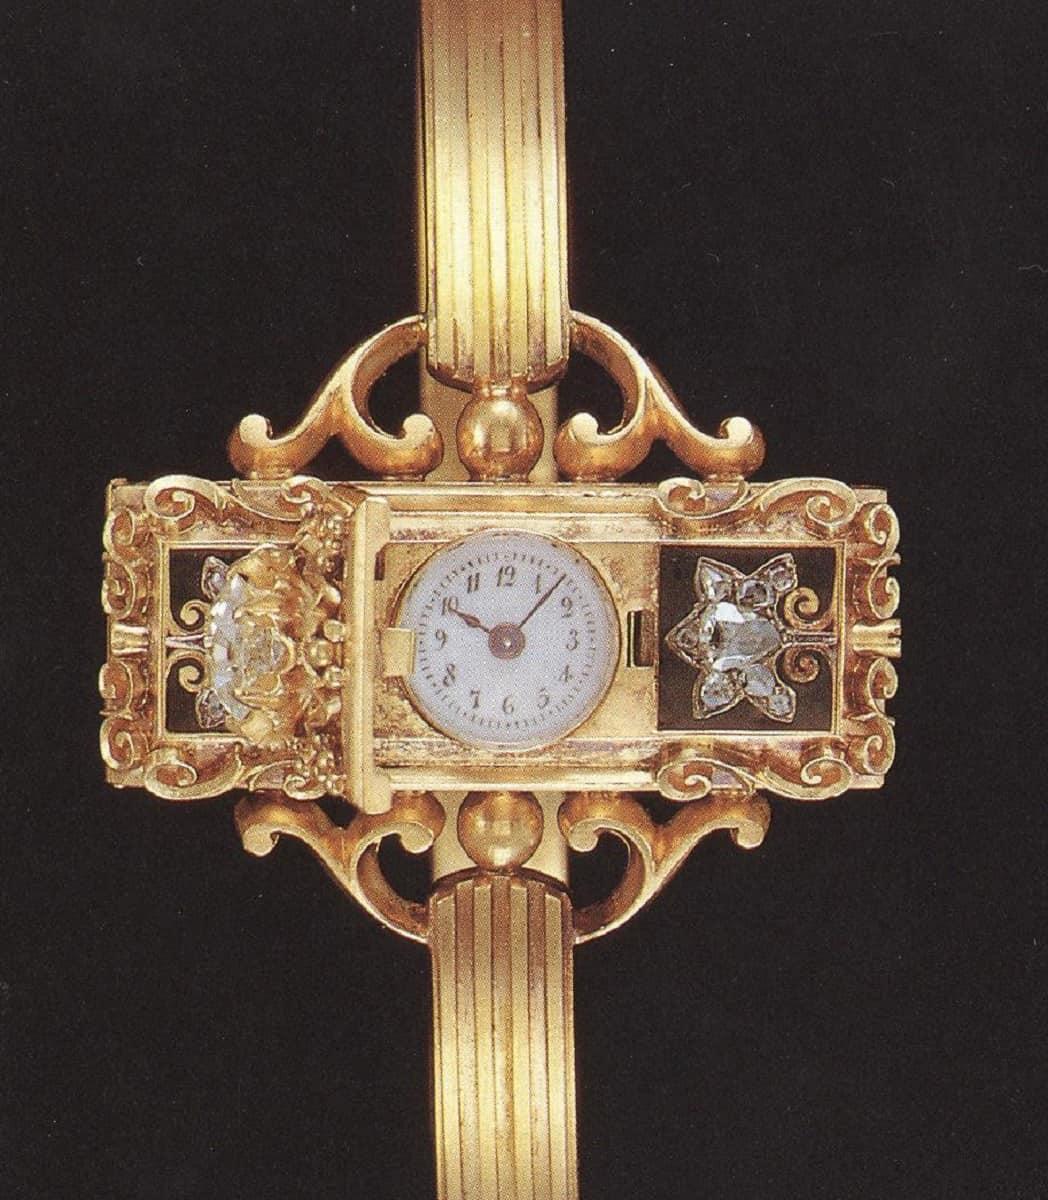 Patek Philippe erste Damenuhr 1868